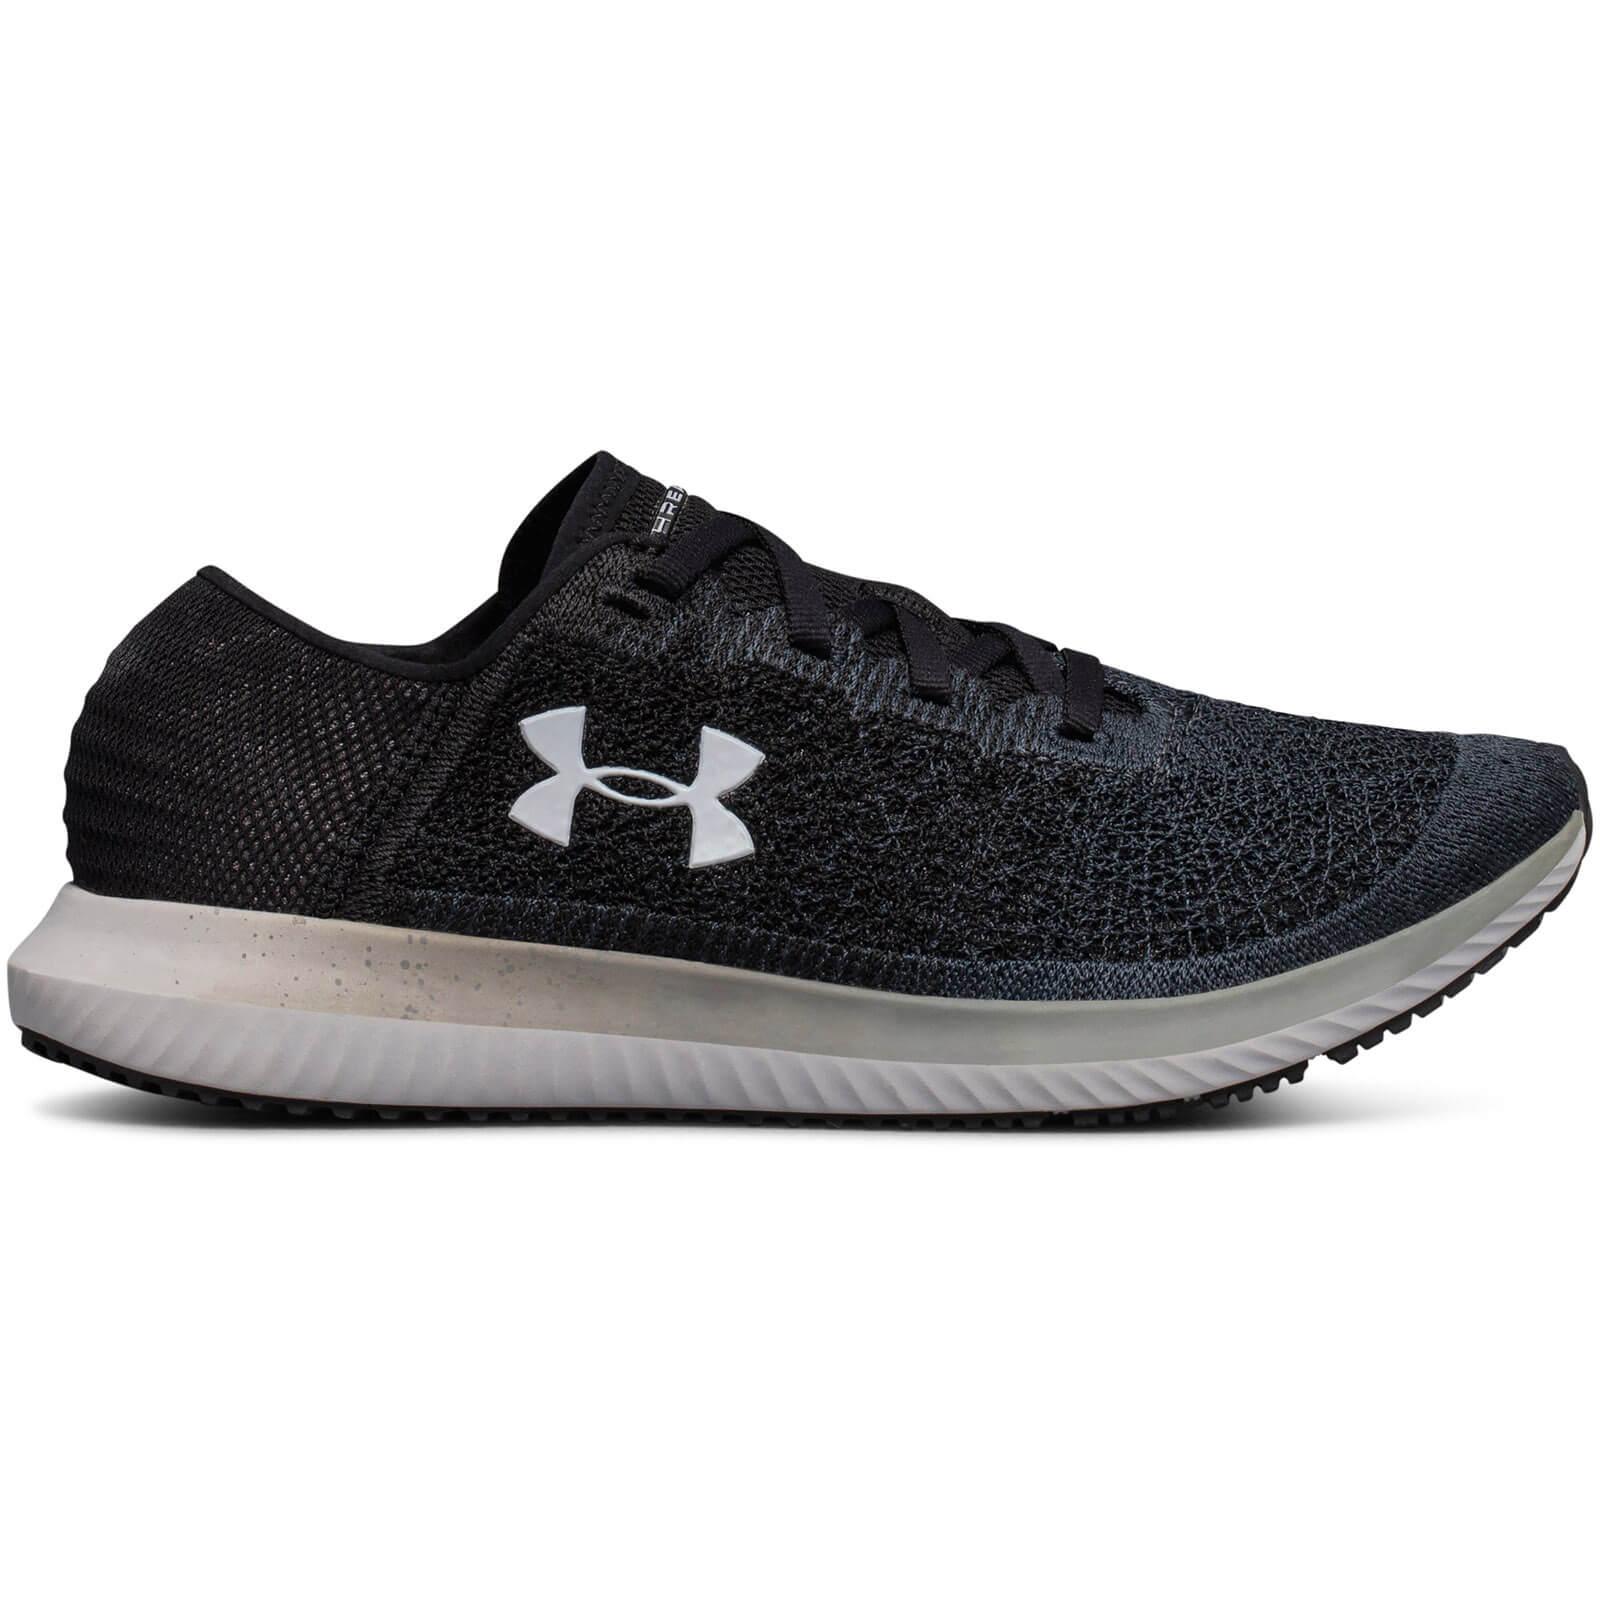 Under Armour Women's Threadborne Blur Running Shoes - Black - US 9/UK 6.5 - Black